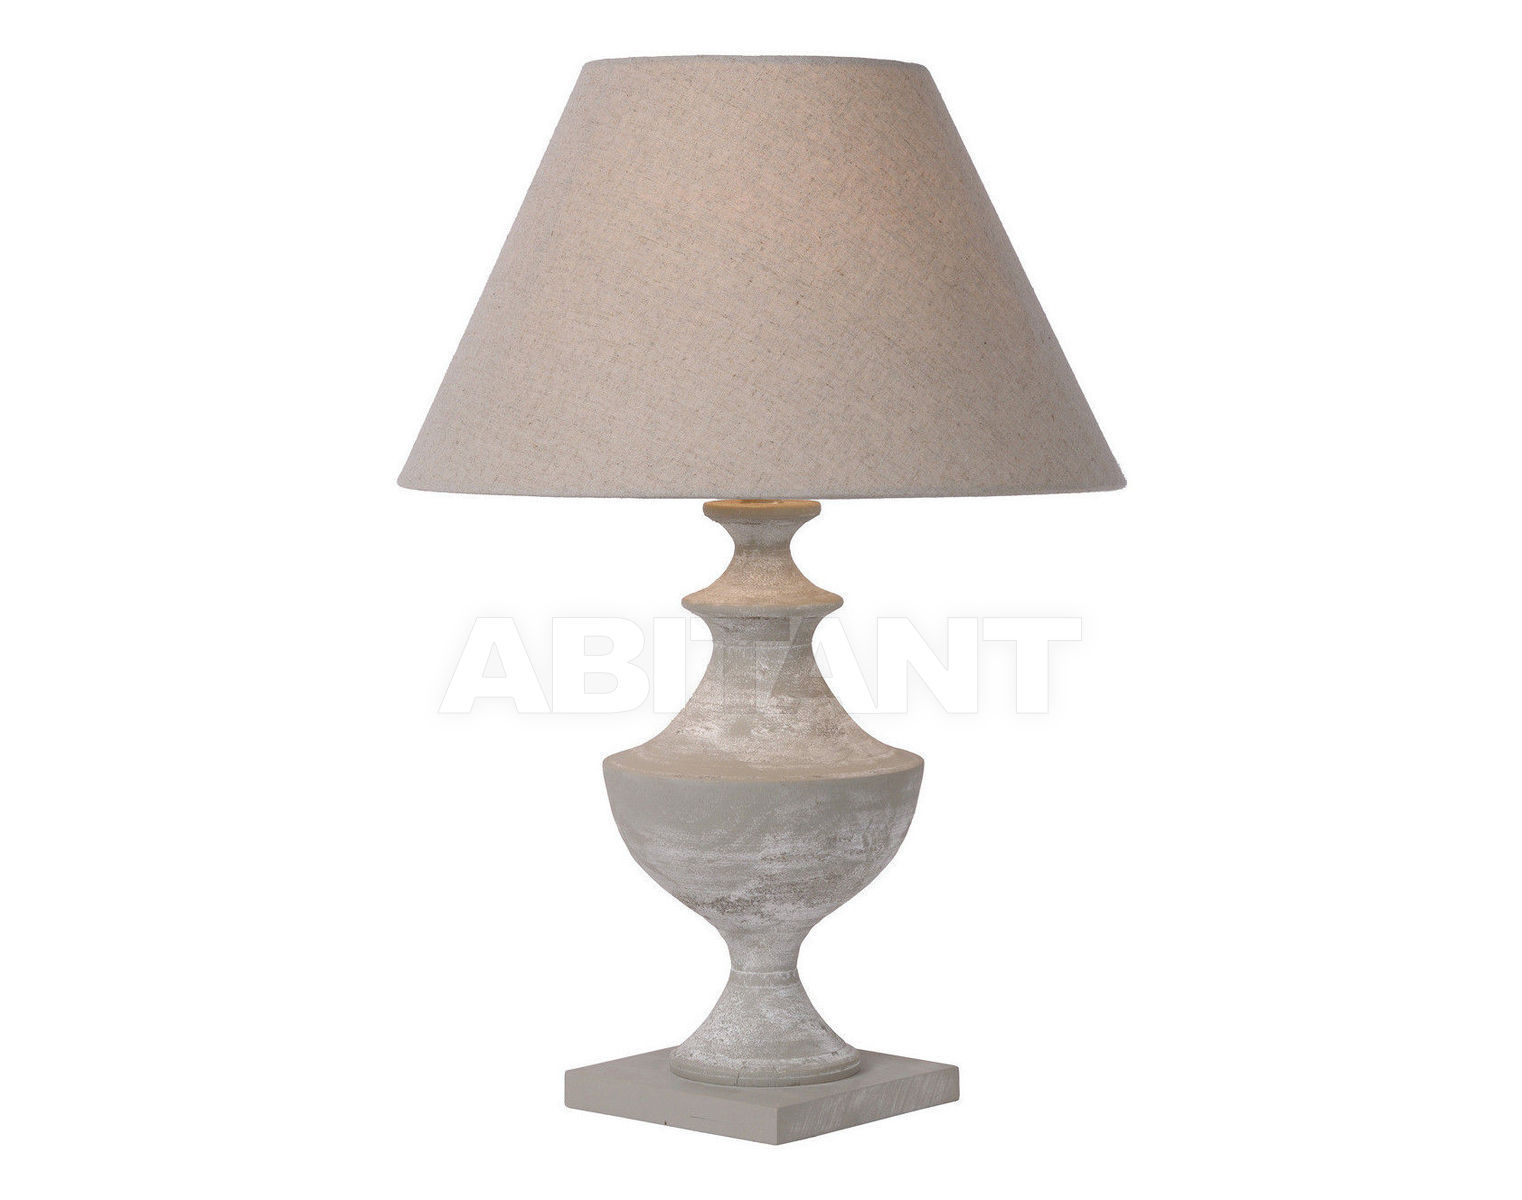 Купить Лампа настольная ROBIN Lucide  Cottage 71536/60/41